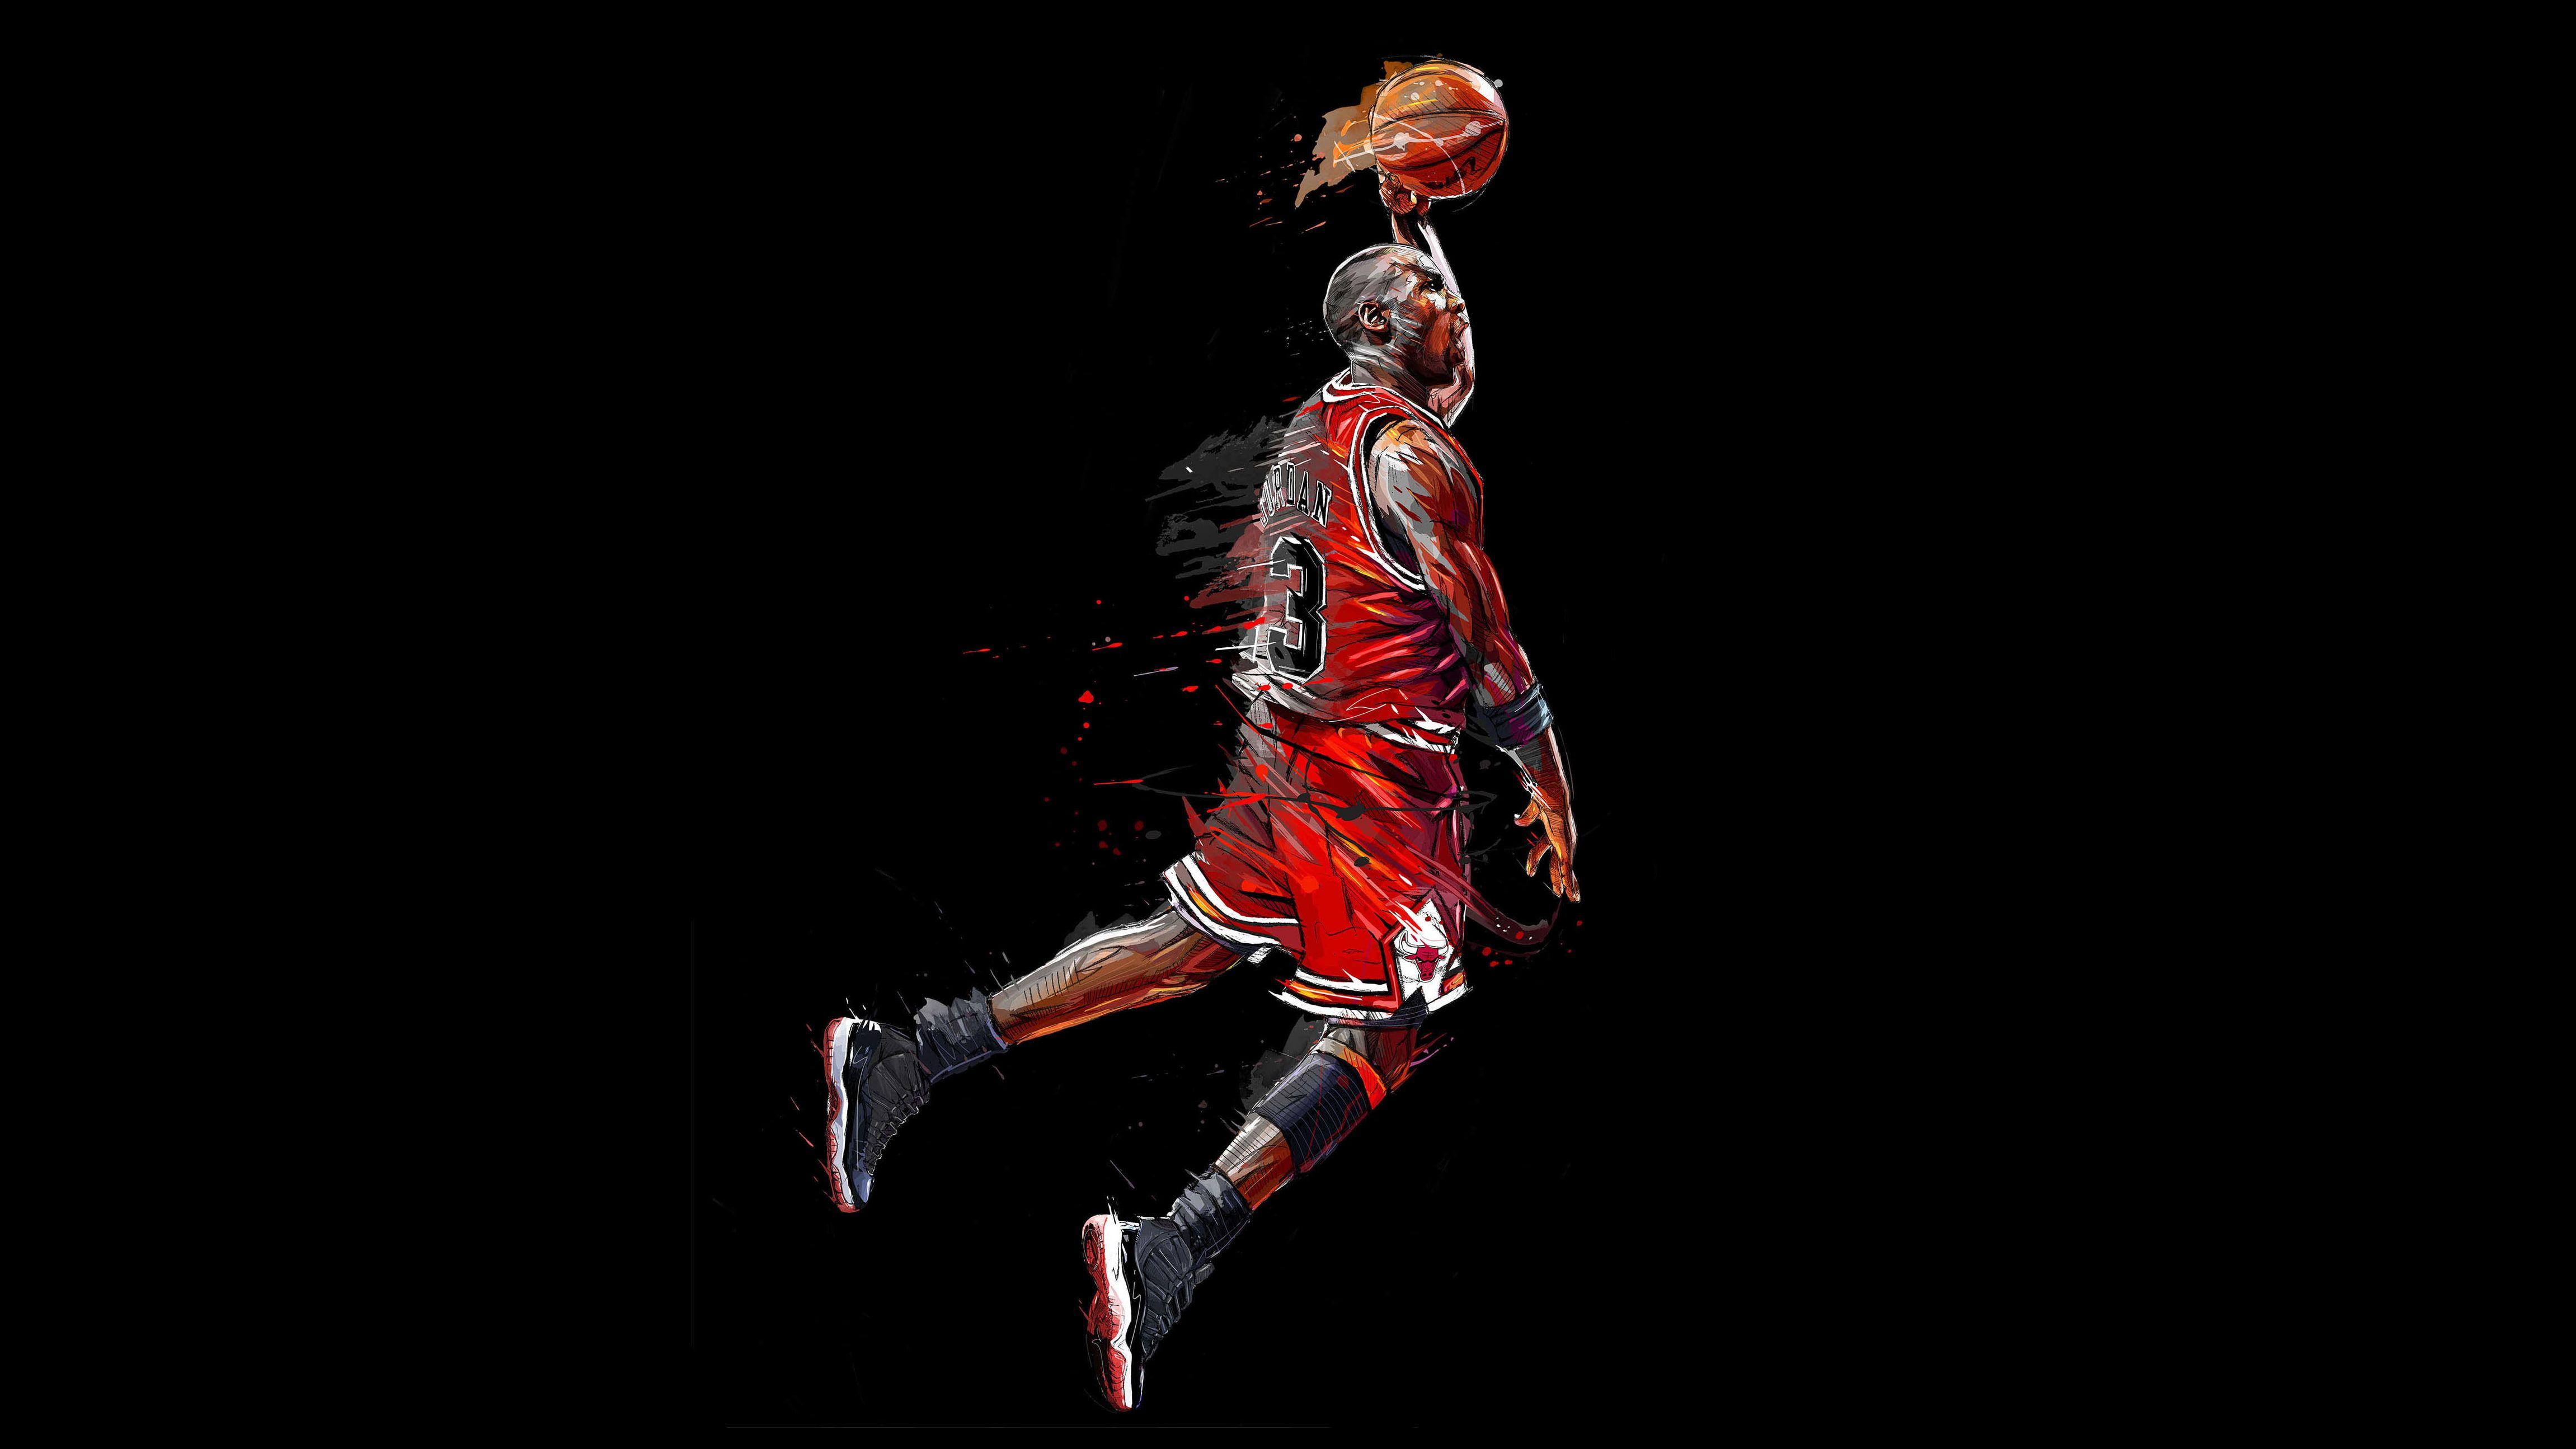 4K Basketball player Chicago Bulls Michael Jordan 4K wallpaper 4604x2590